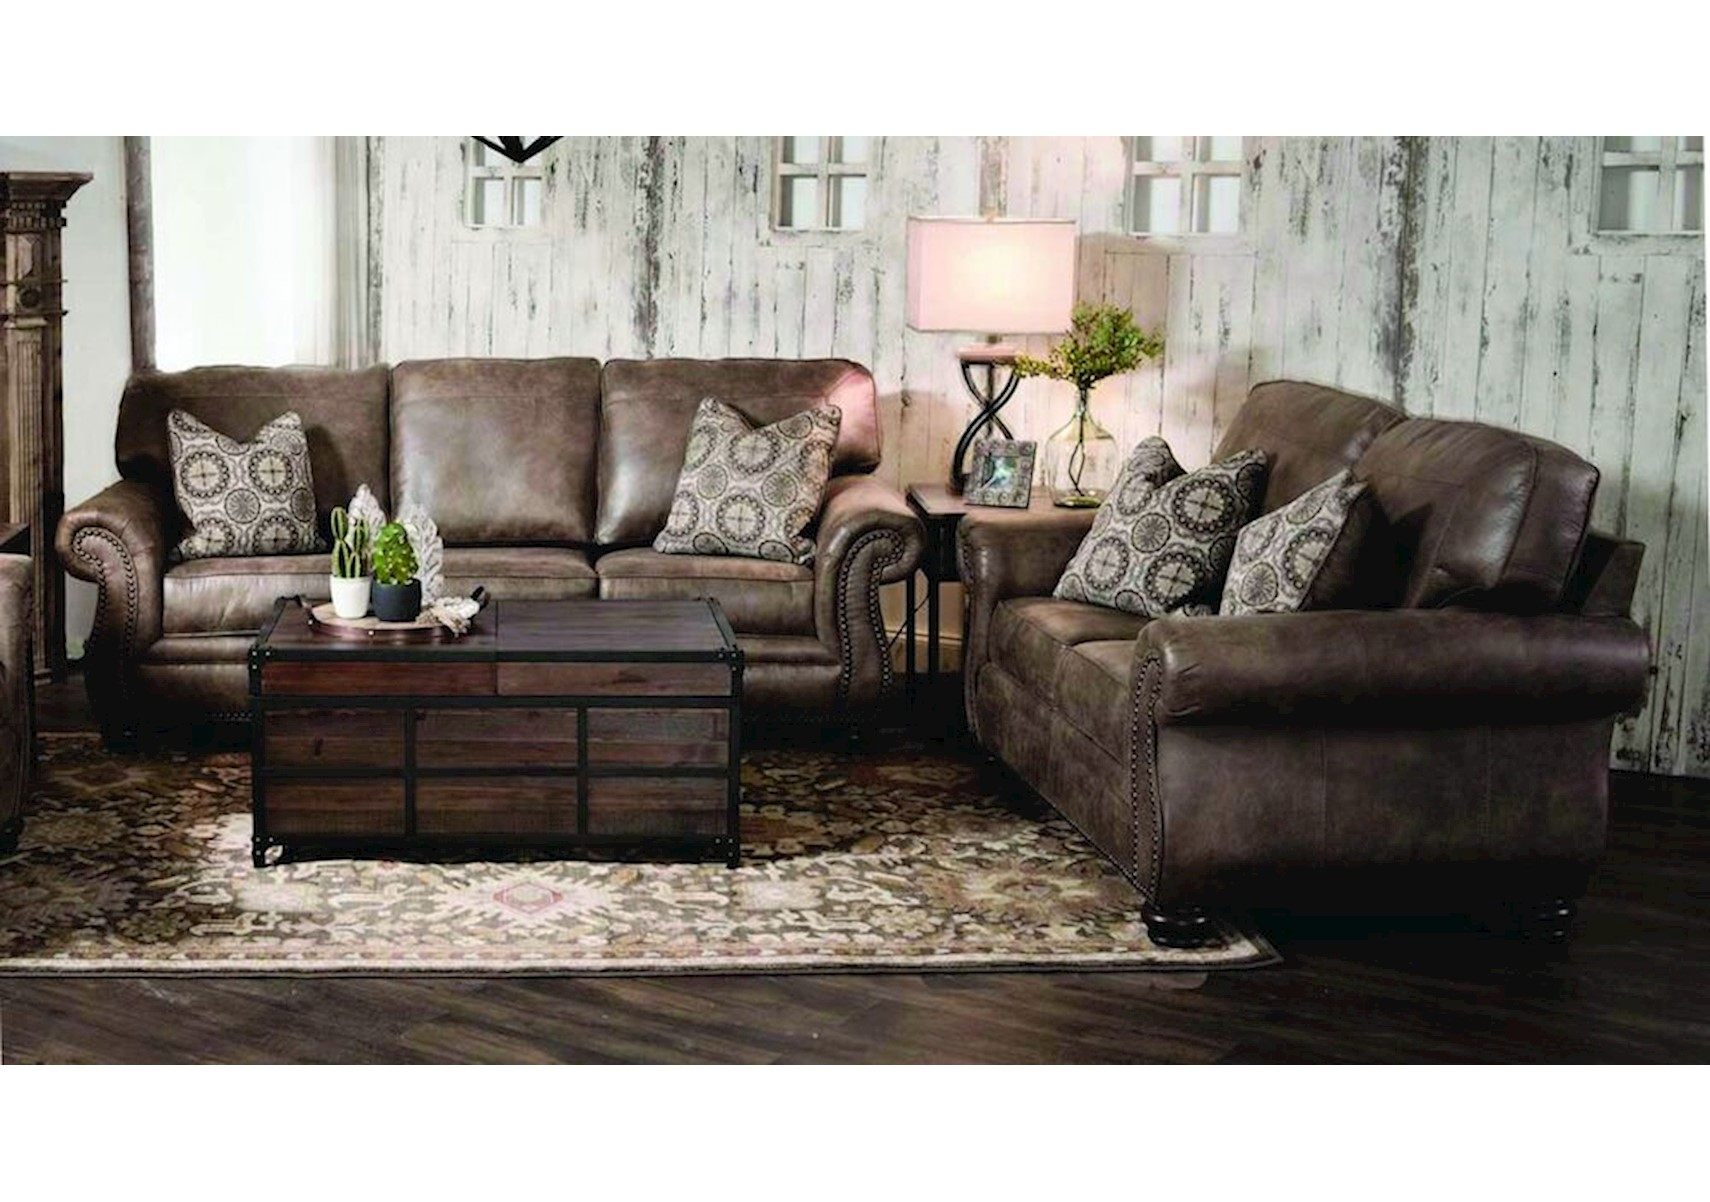 Lacks Rustic 2 Pc Living Room Set, Living Room Set